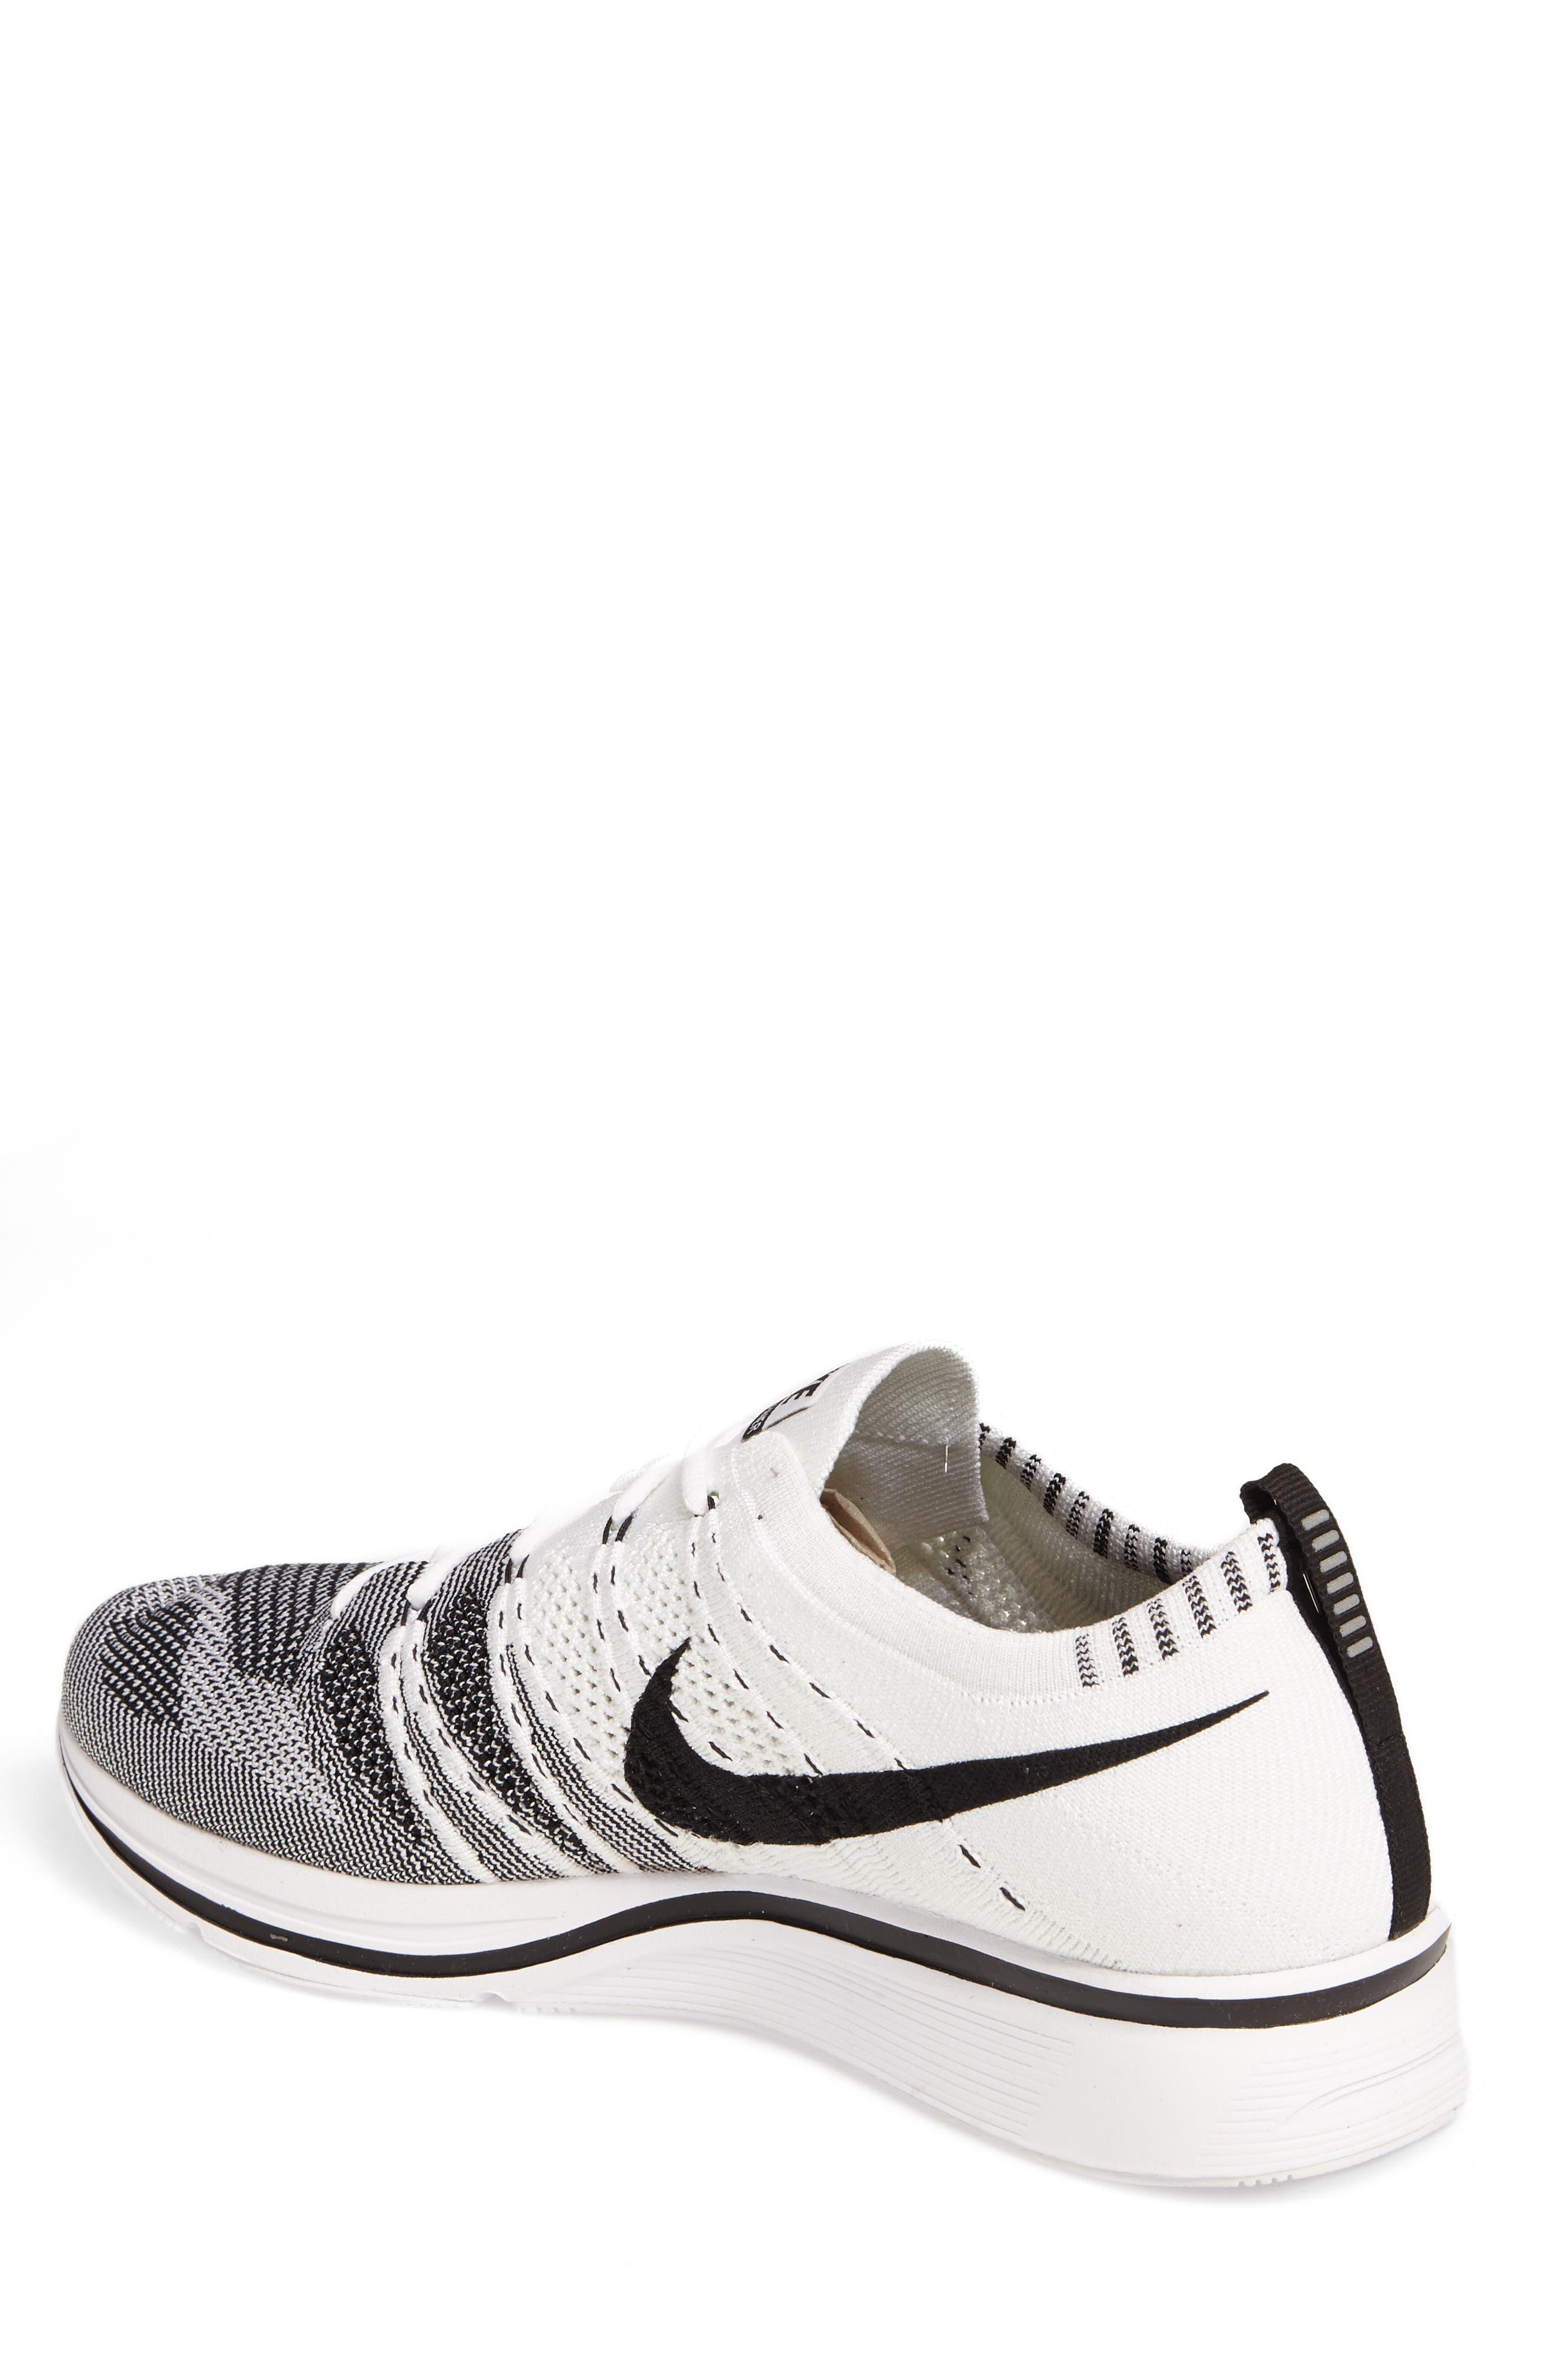 NikeLab Flyknit Trainer Sneaker,                             Alternate thumbnail 2, color,                             100